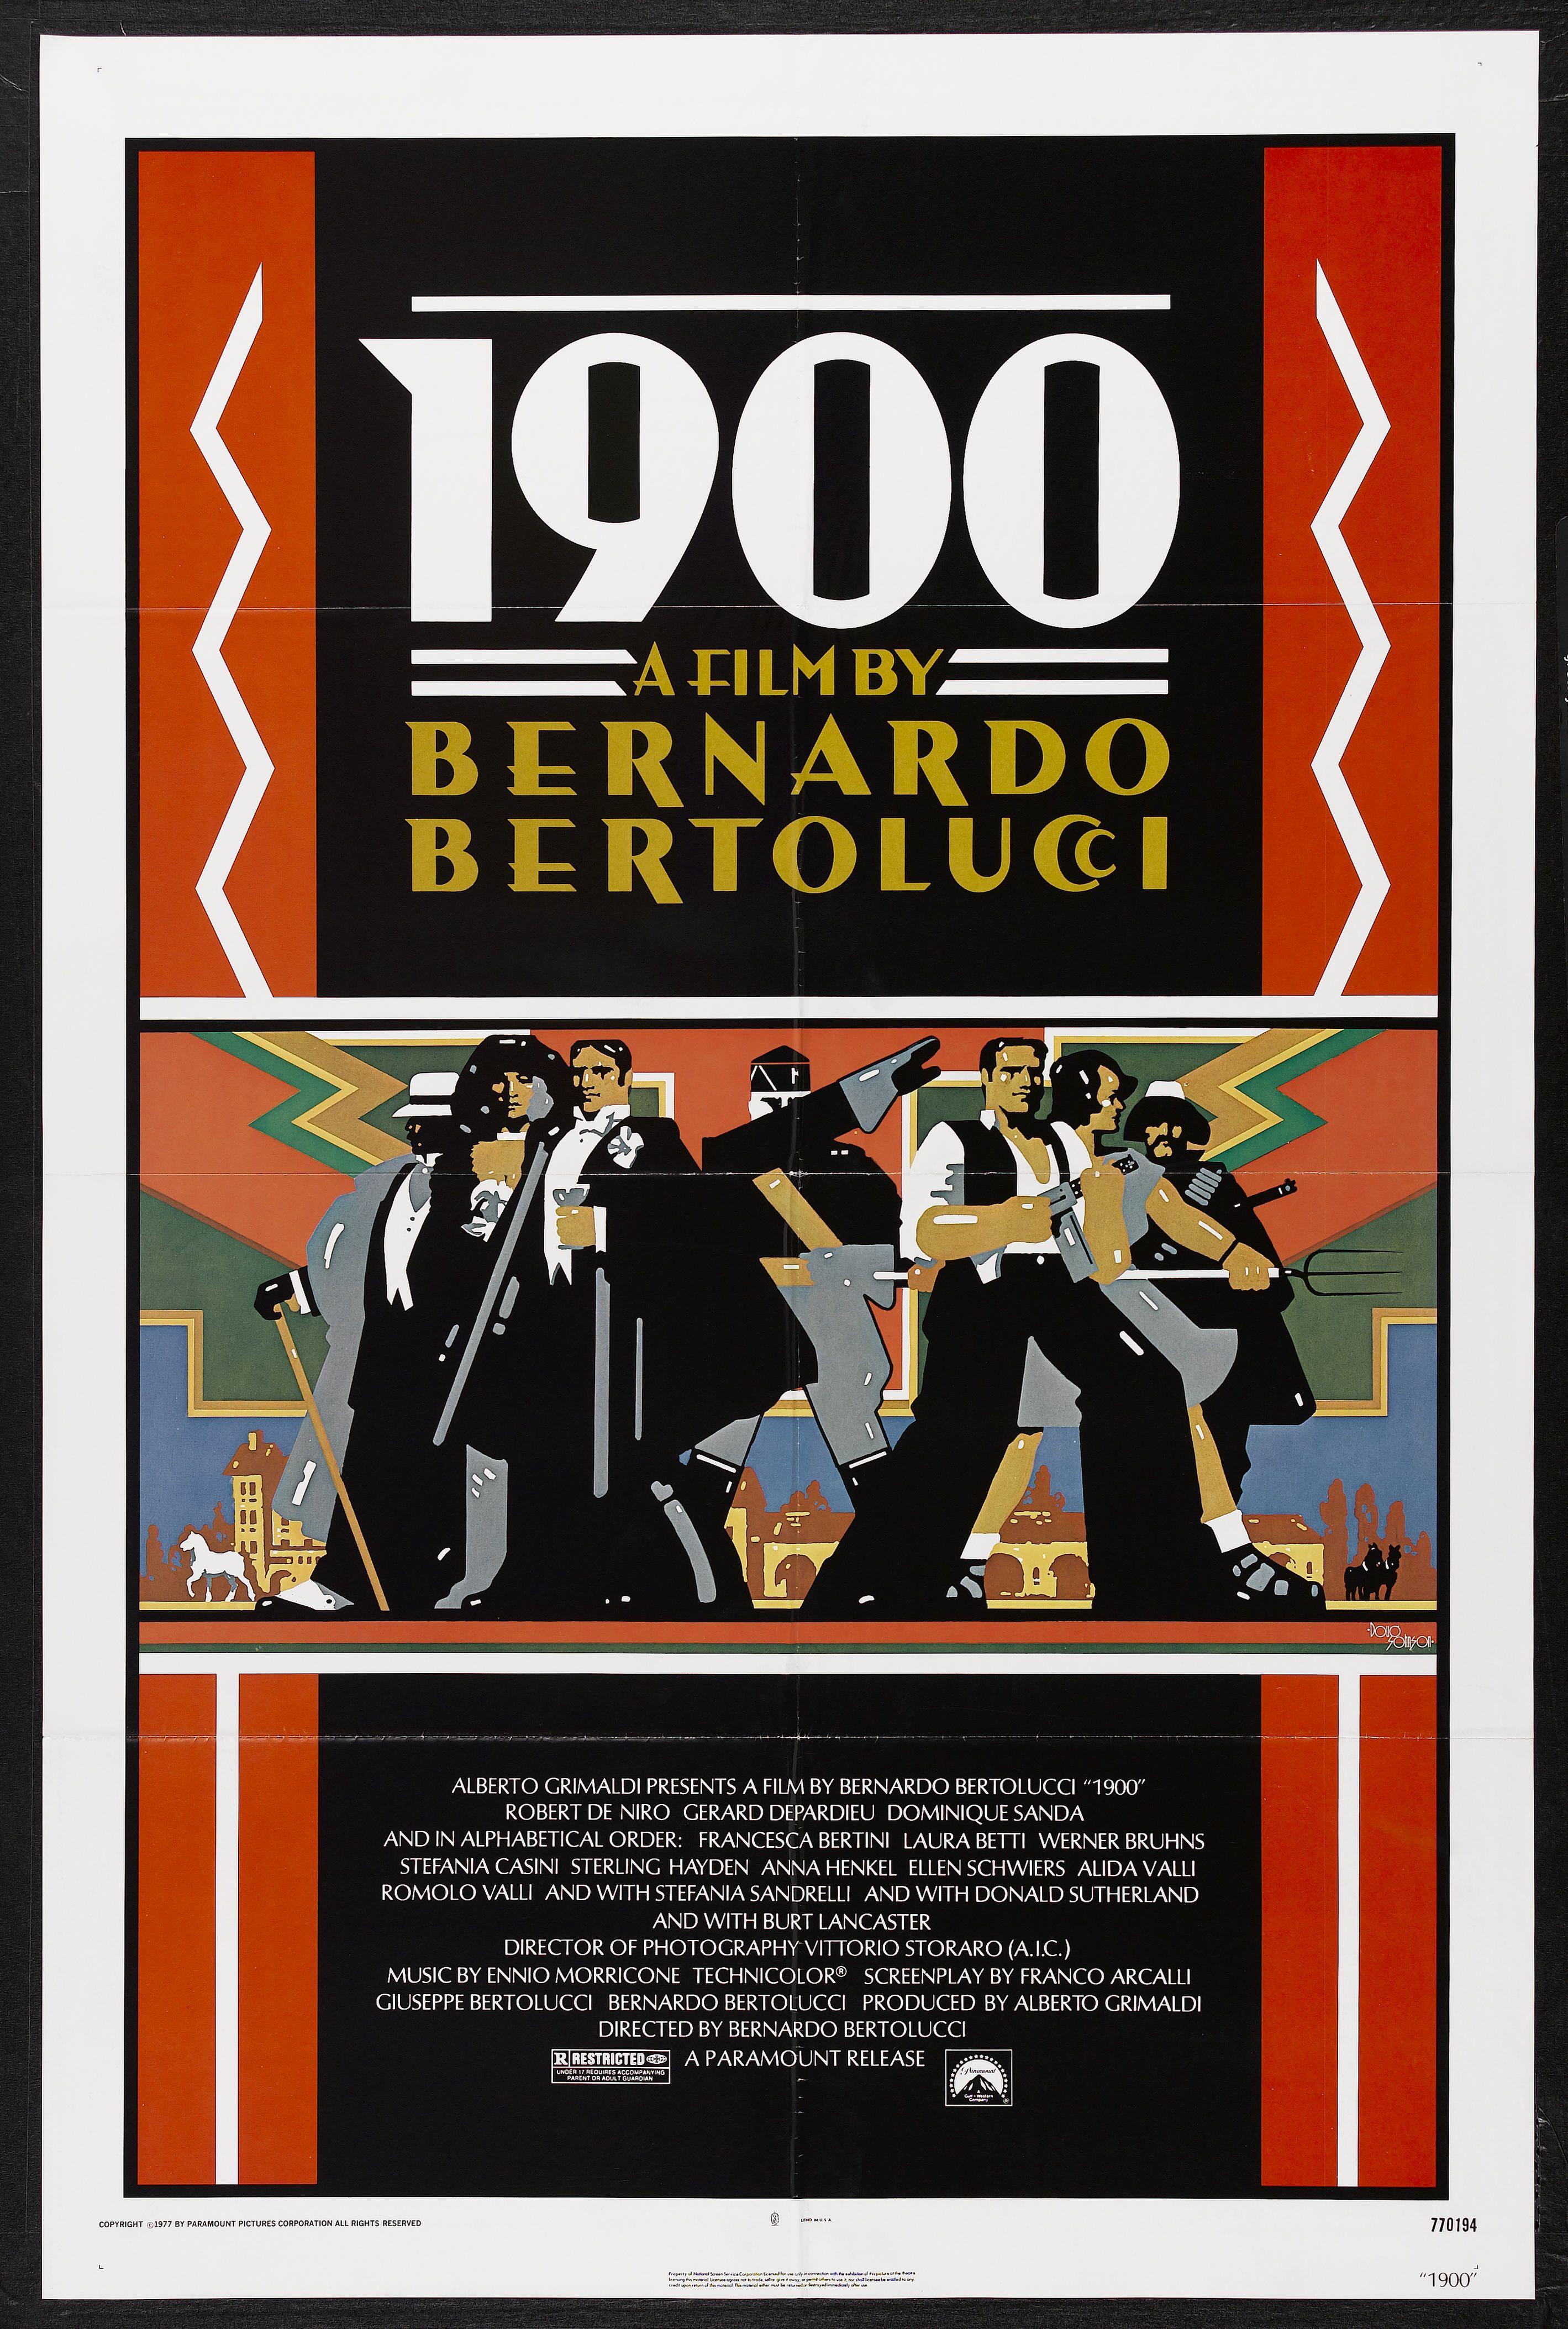 Novecento Bernardo Bertolucci 1976 Respiro Skinner